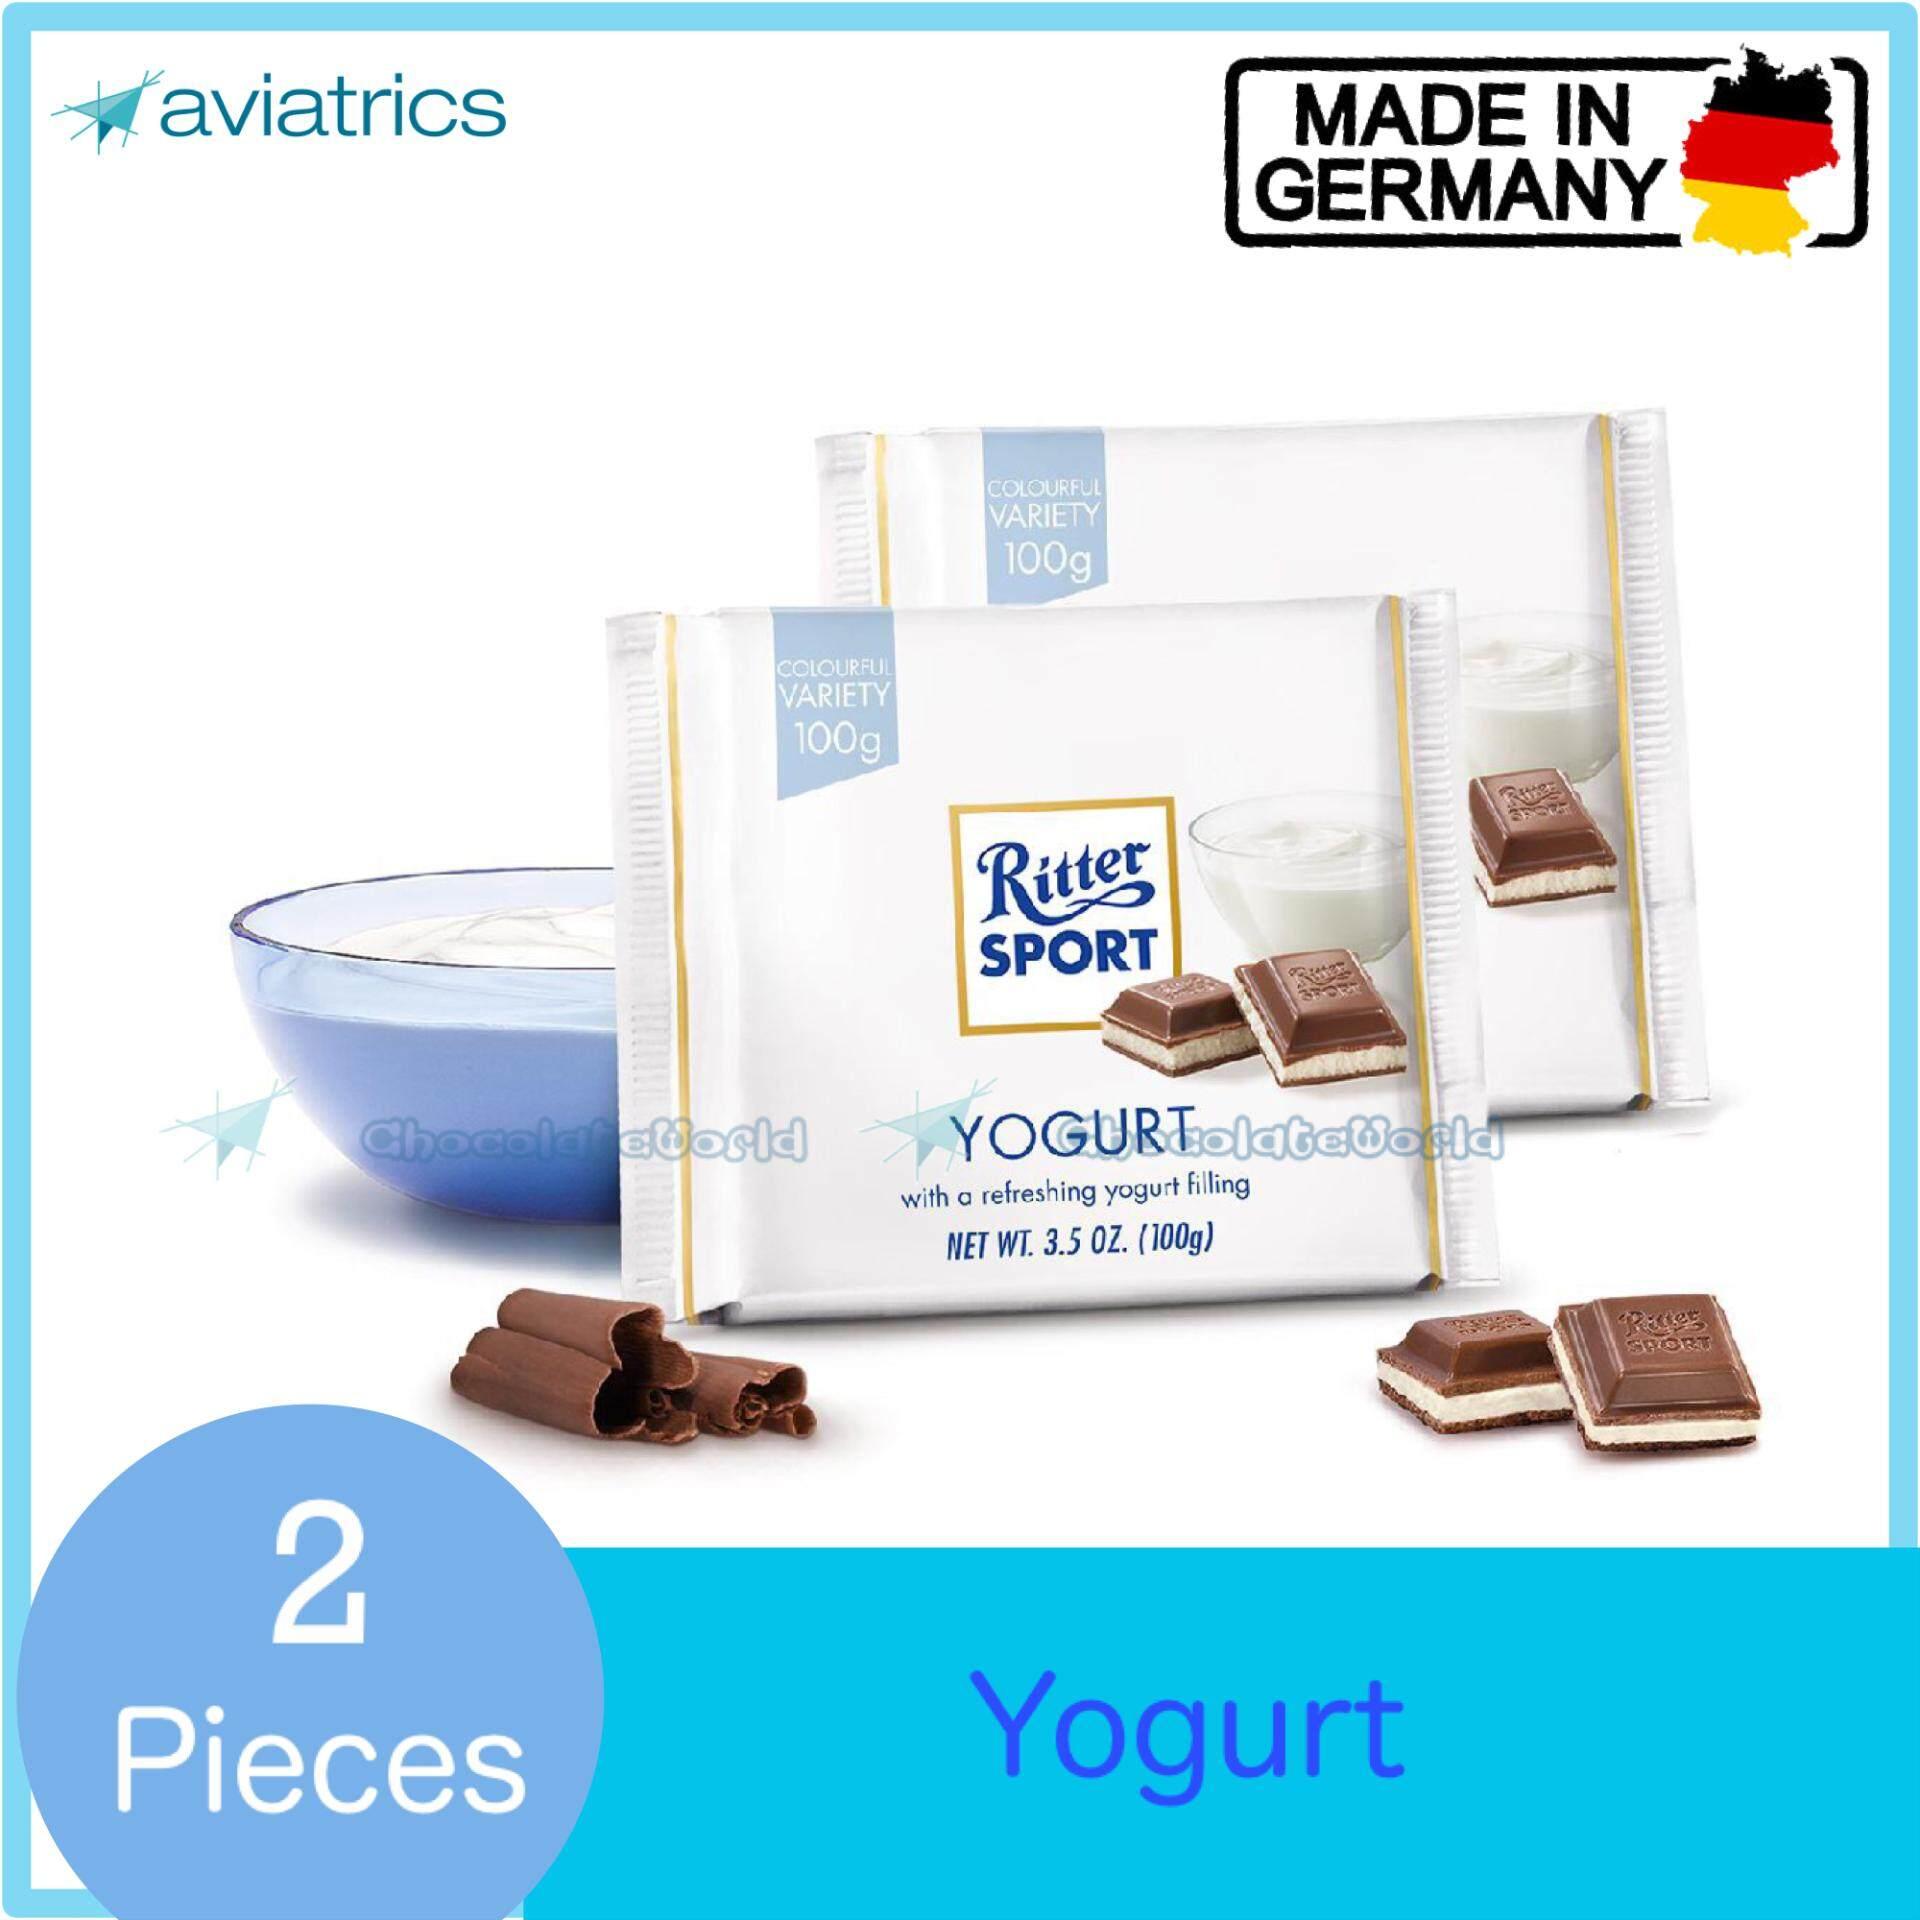 Ritter Sport Yogurt 100g X 2 (Made in Germany)